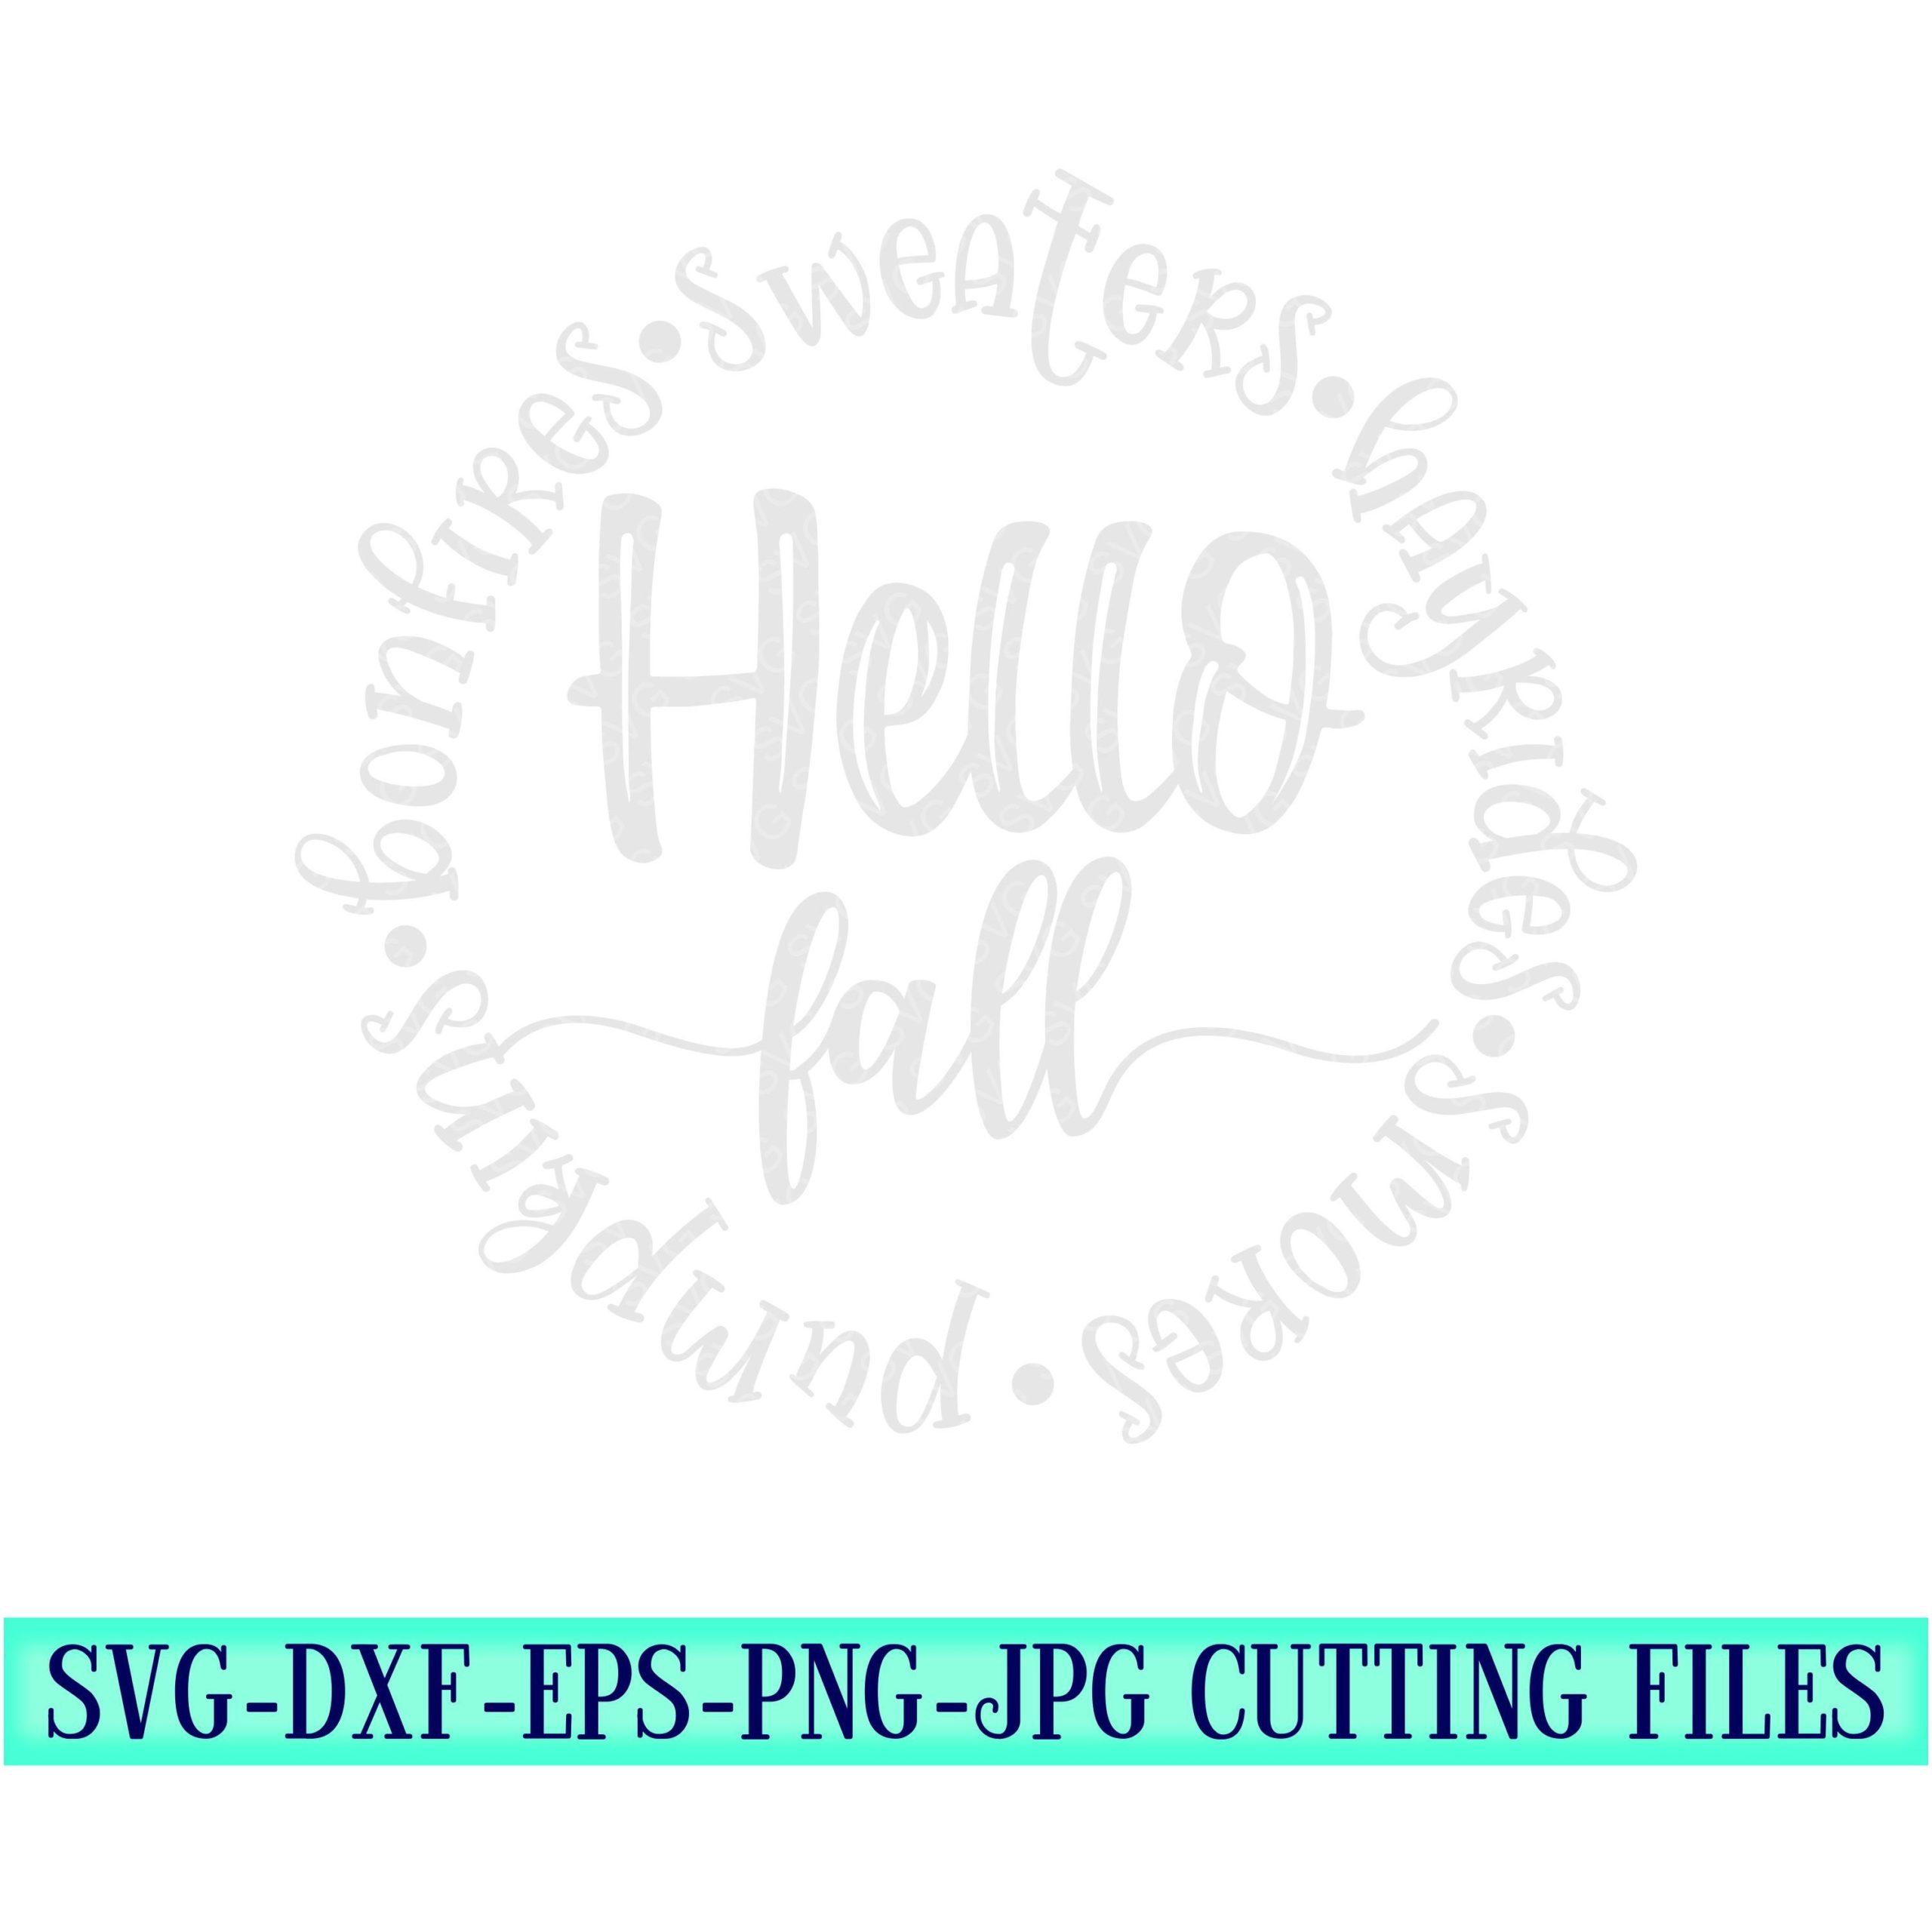 Hello-fall-svg-fall-svg-fall-quote-seasons-fall-saying-fall-svg-designs-fall-cut-files-cricut-cut-files-silhouette-cut-files-5f6f6e8a